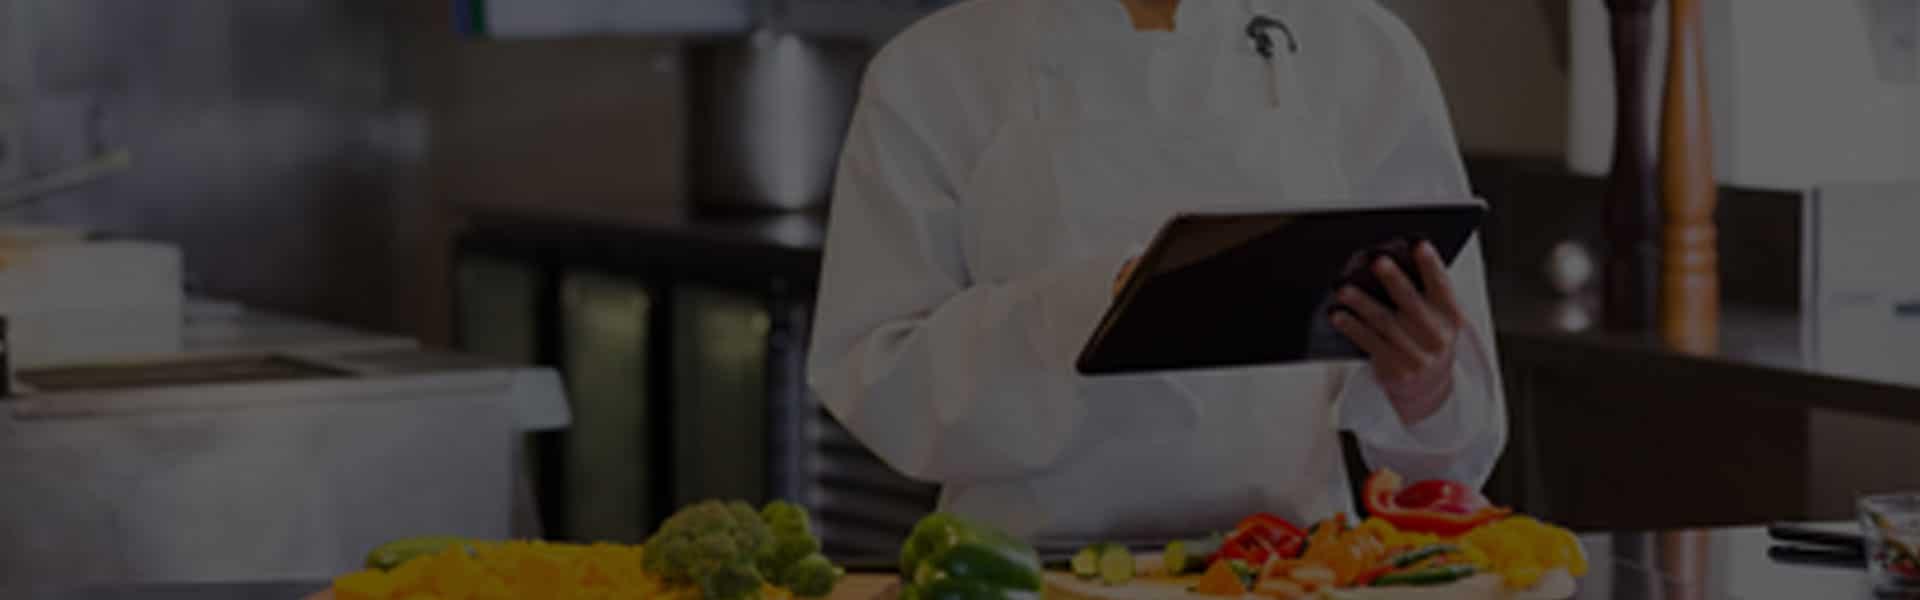 Payroll Management System